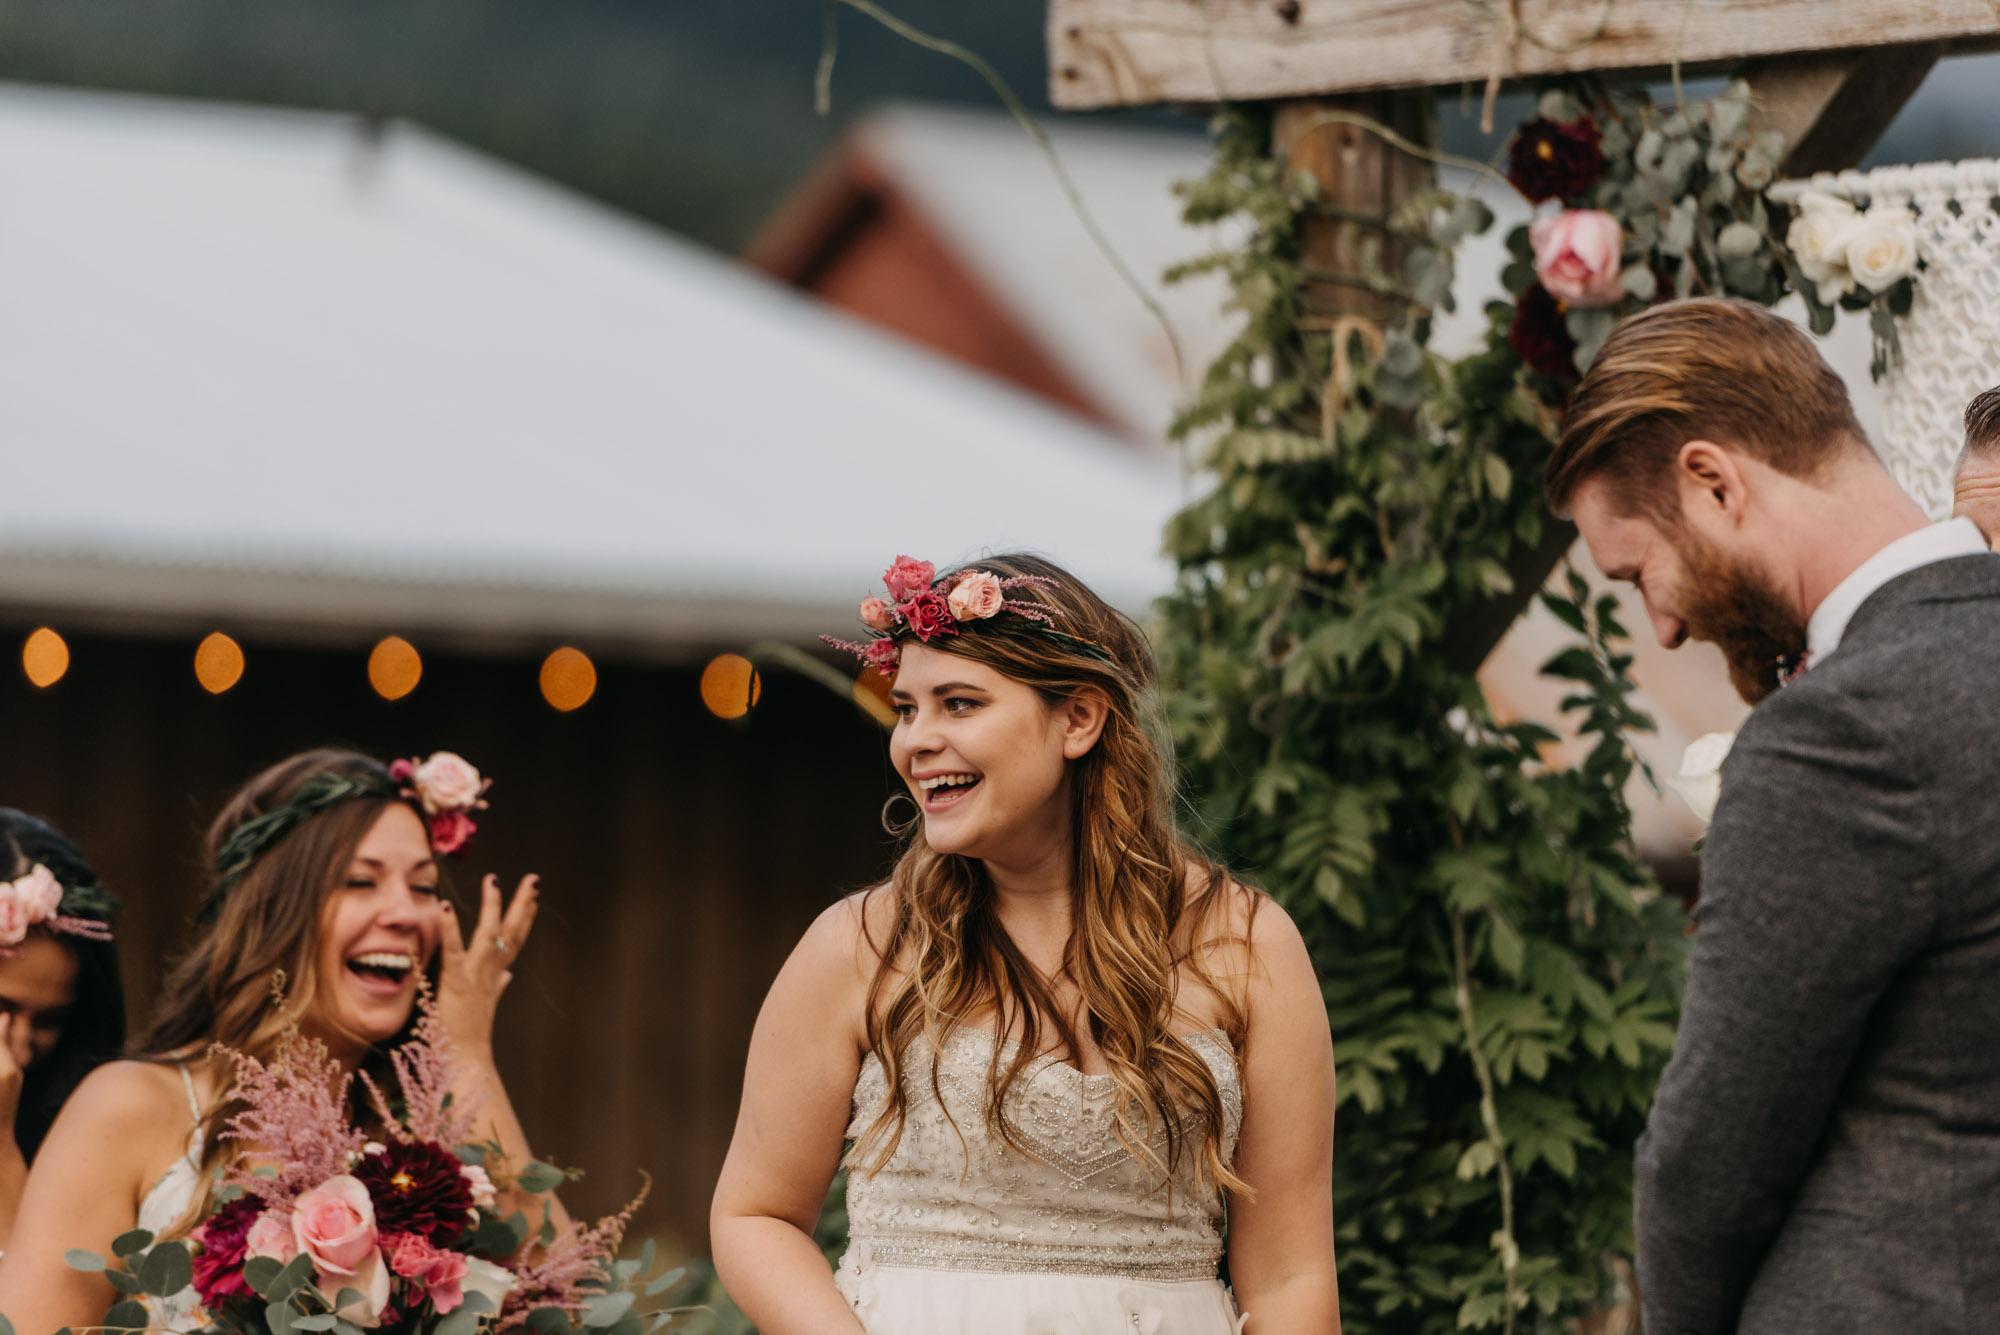 Outdoor-Summer-Ceremony-Washington-Wedding-Rainbow-9089.jpg